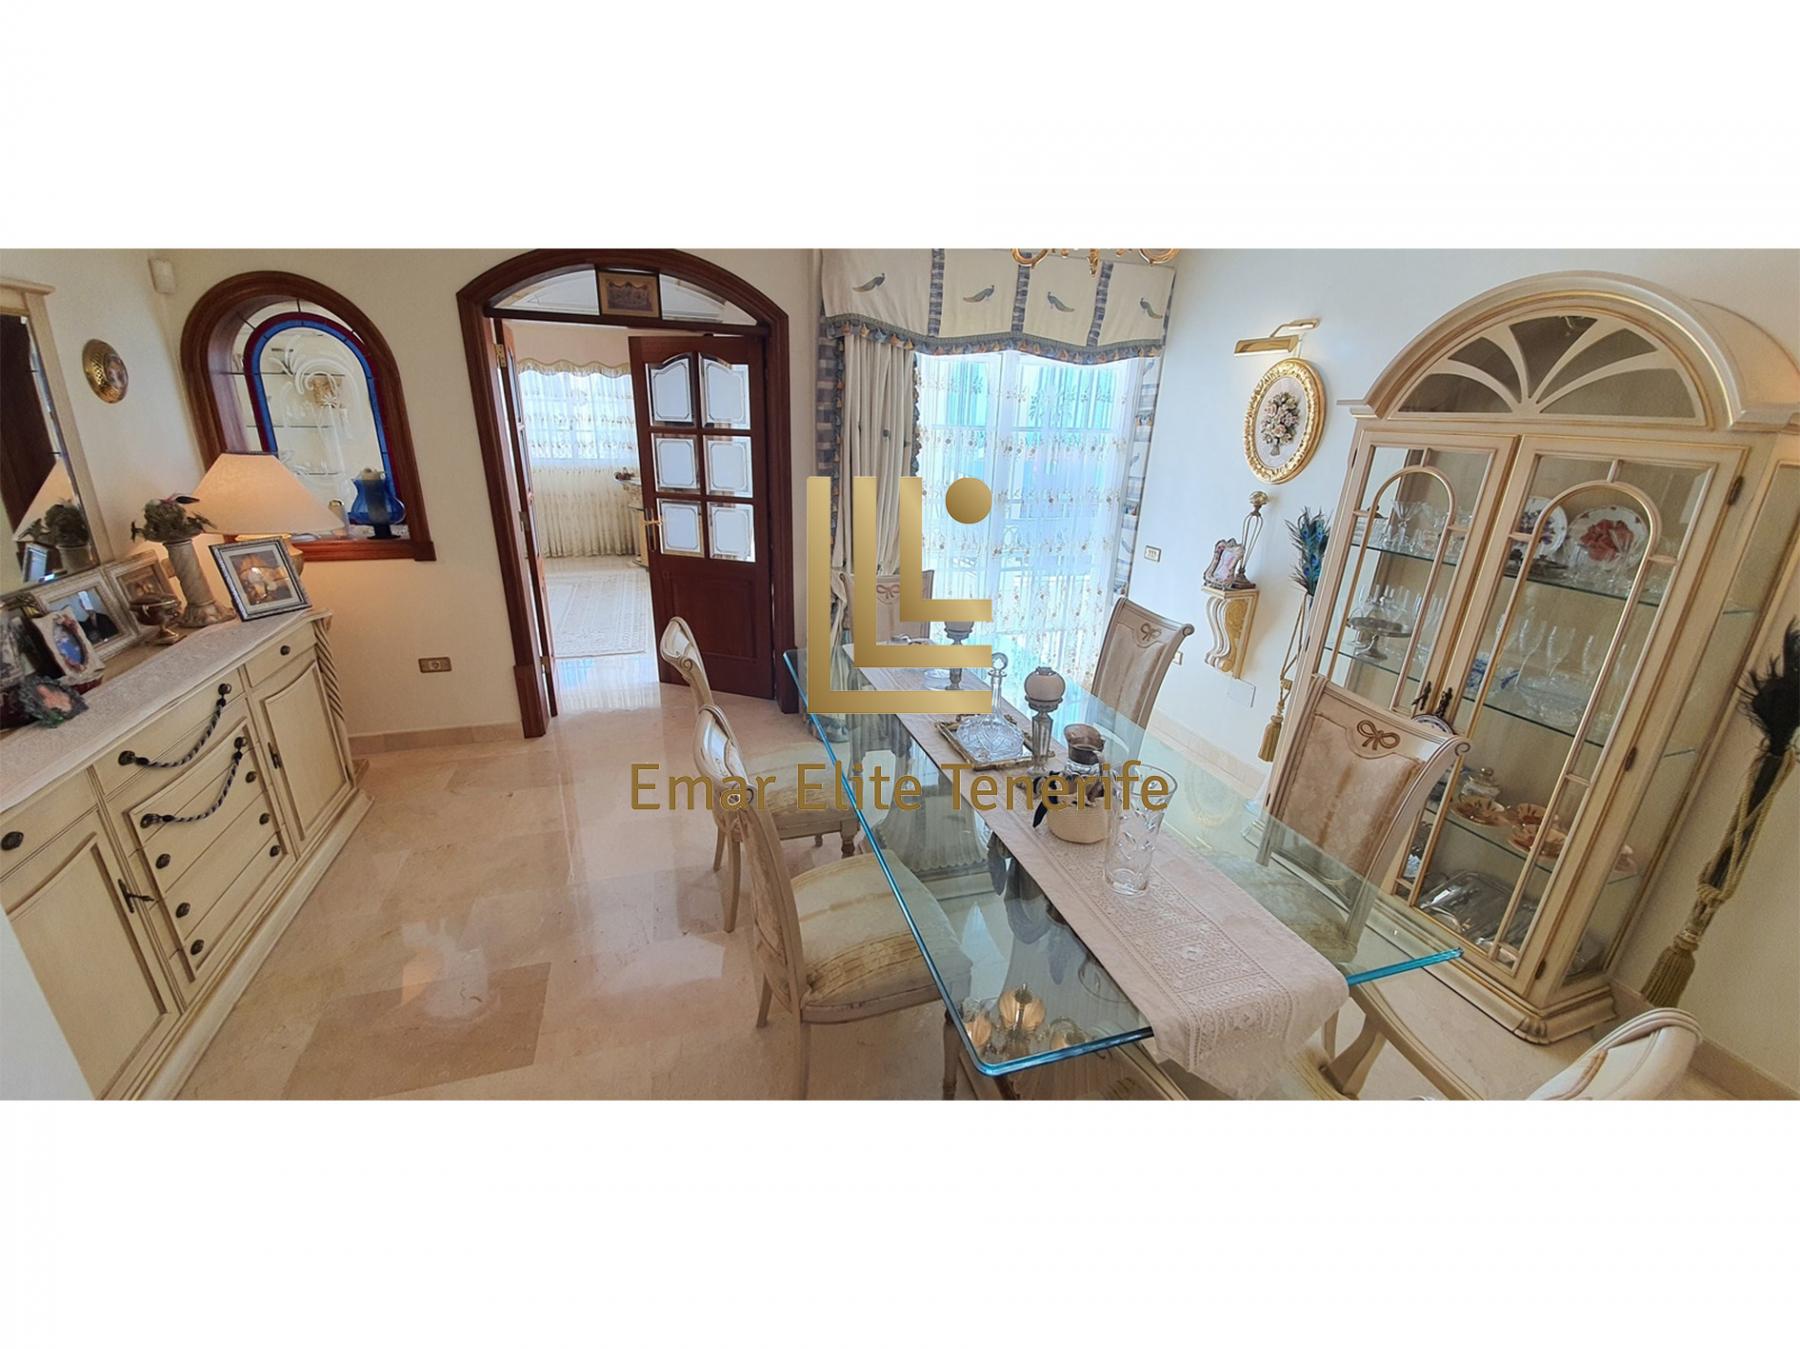 room-gallery